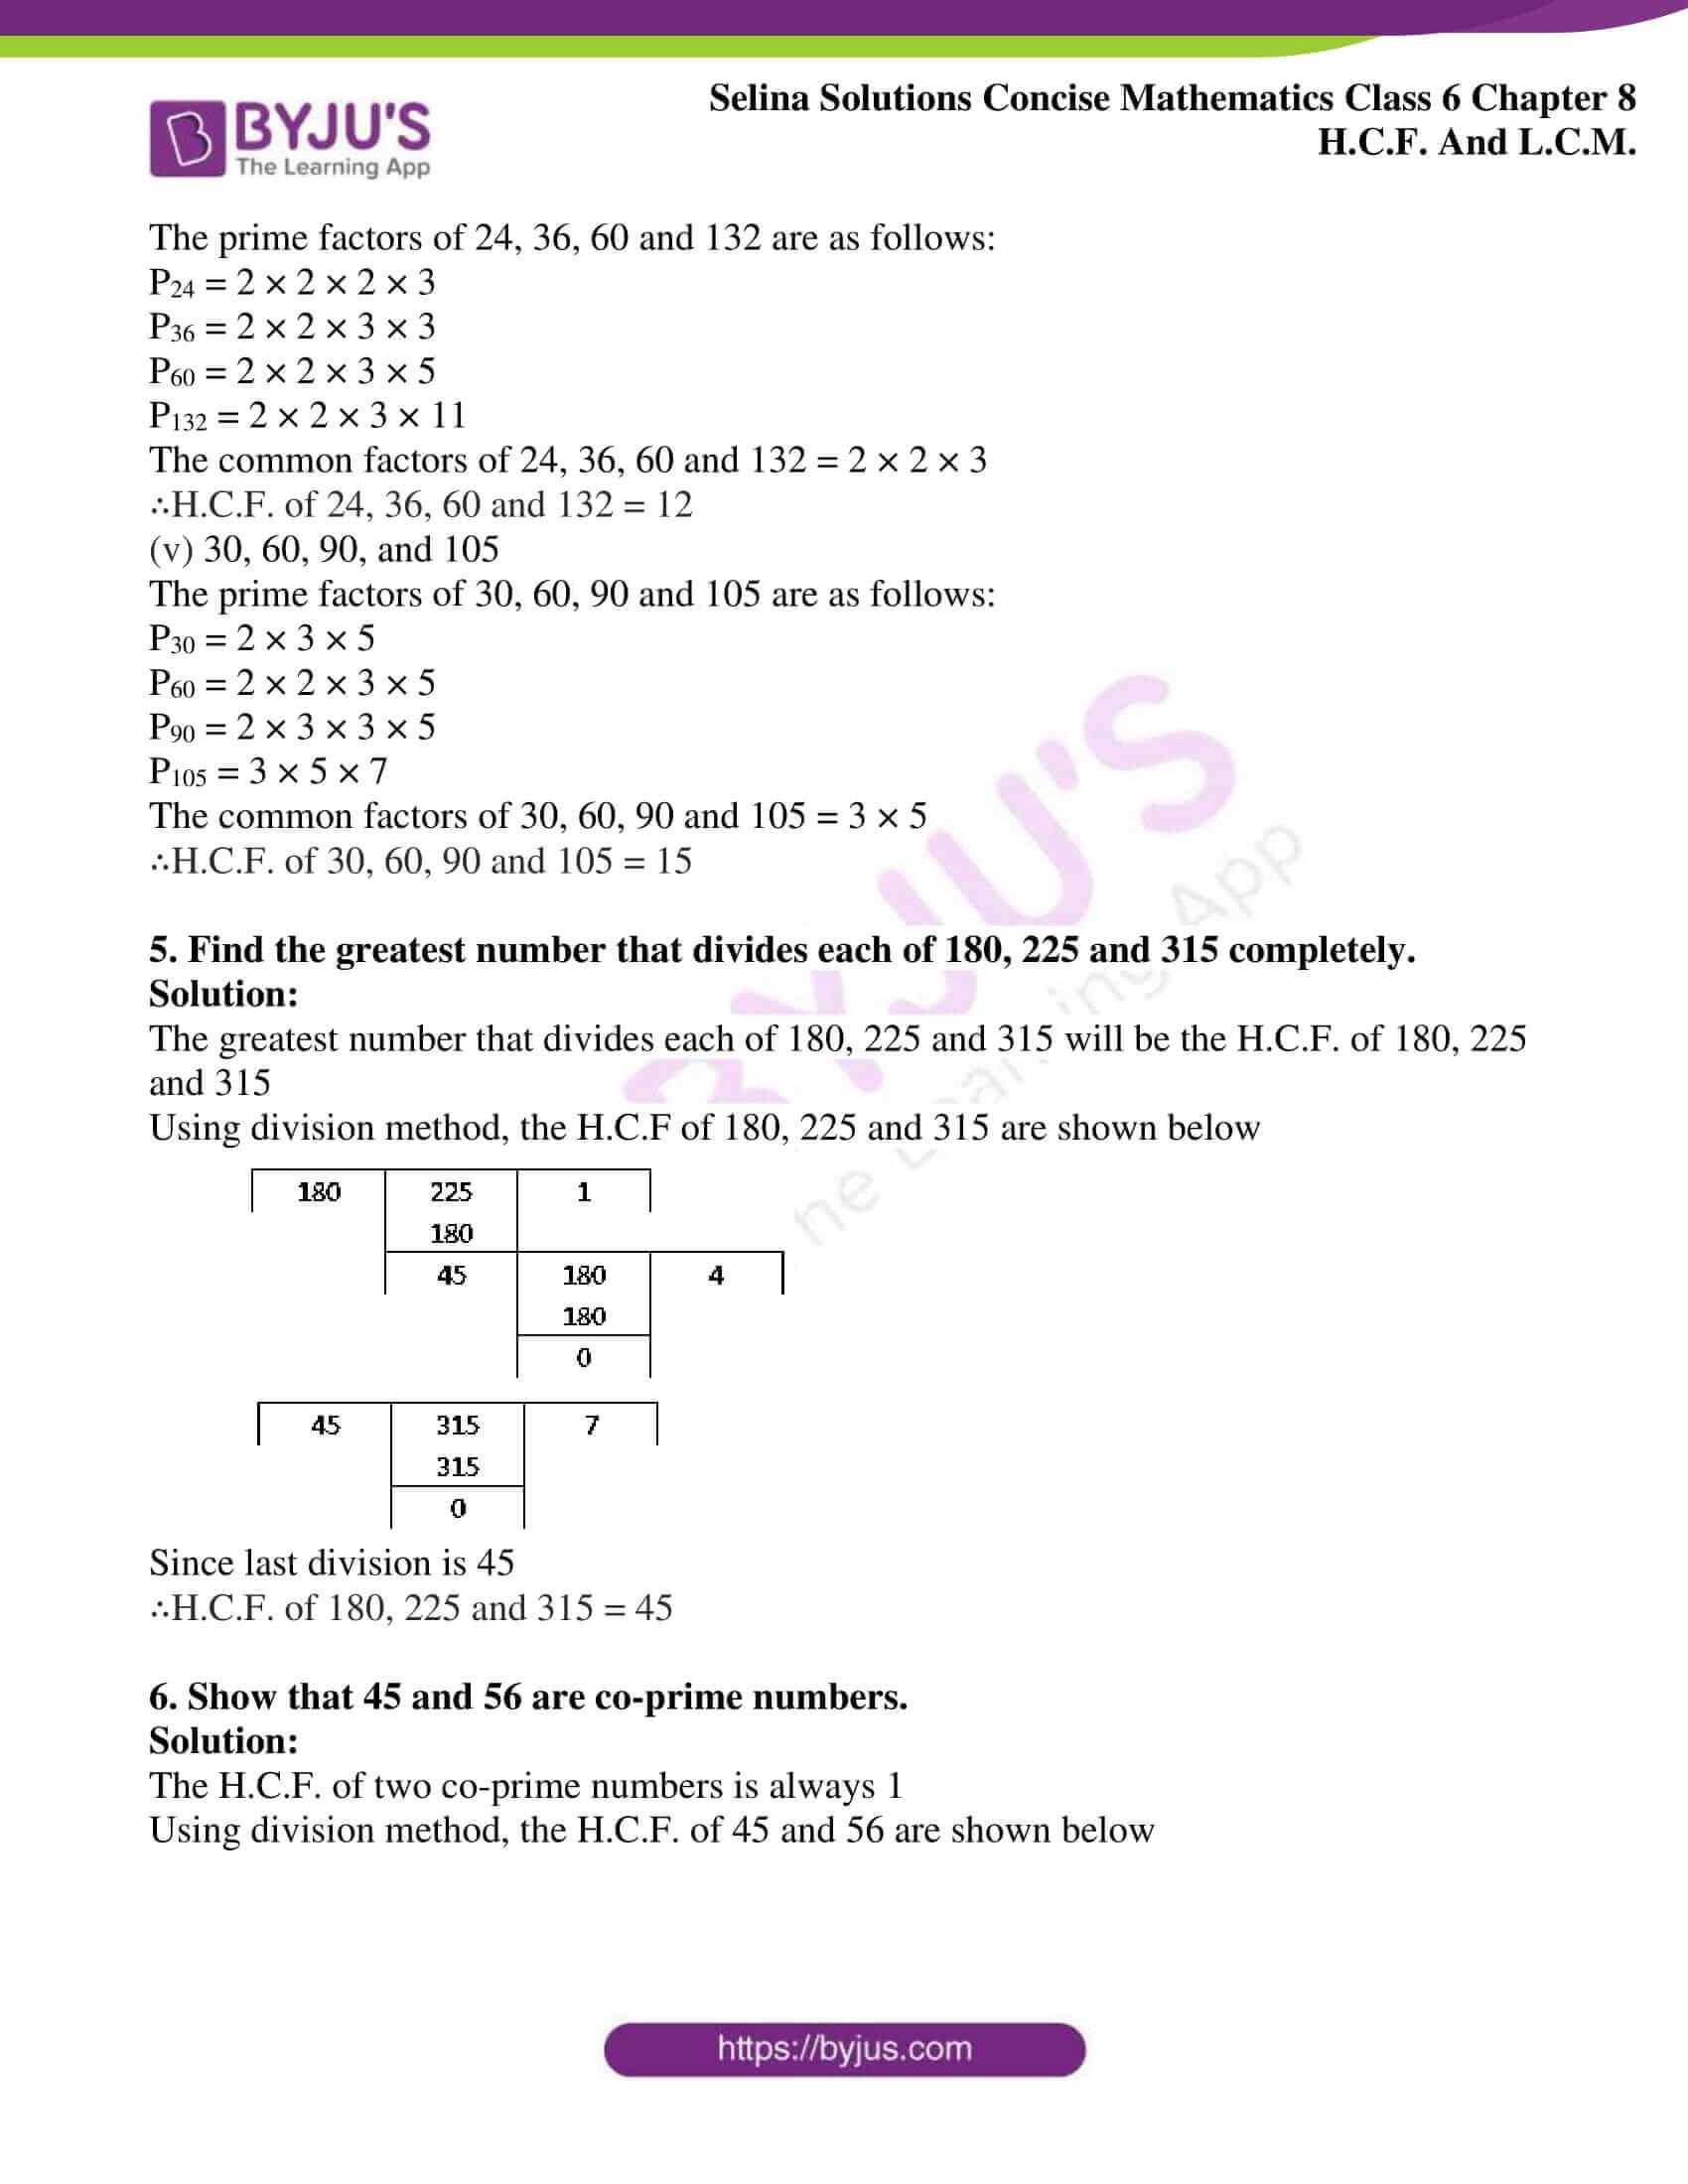 selina sol concise mathematics class 6 ch 8 ex b 6